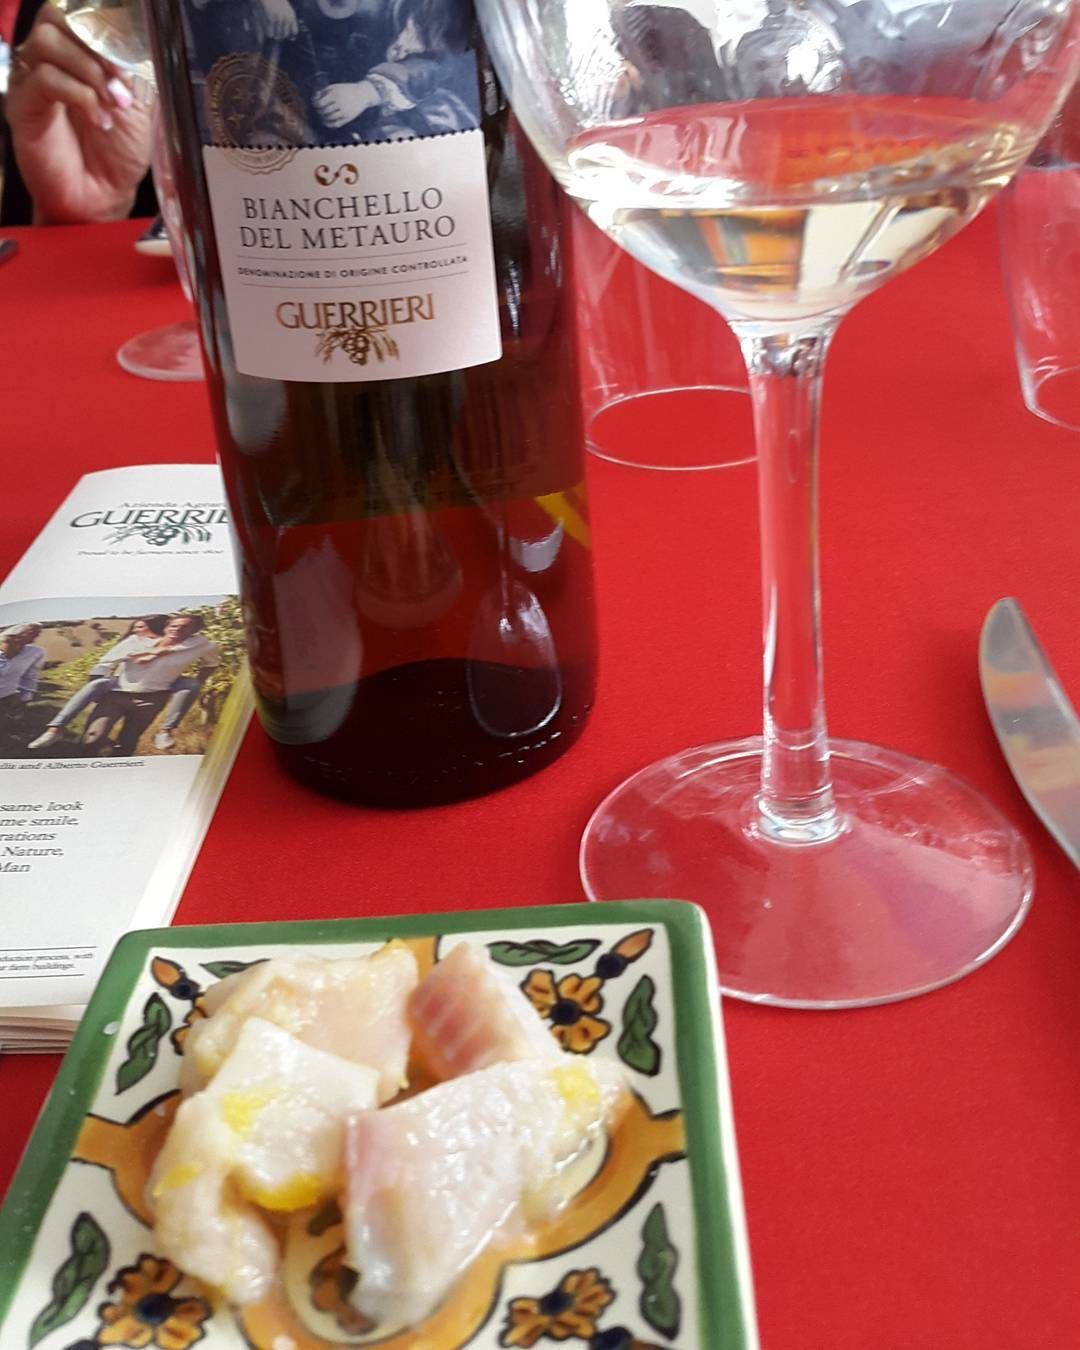 Maridaje Con Pescado En Salsa De Naranja Y Vino Bianchello Del Metauro En La Bottega Privee Te Invita Adondeirhoy Com La P In 2020 Food Alcoholic Drinks Martini Glass